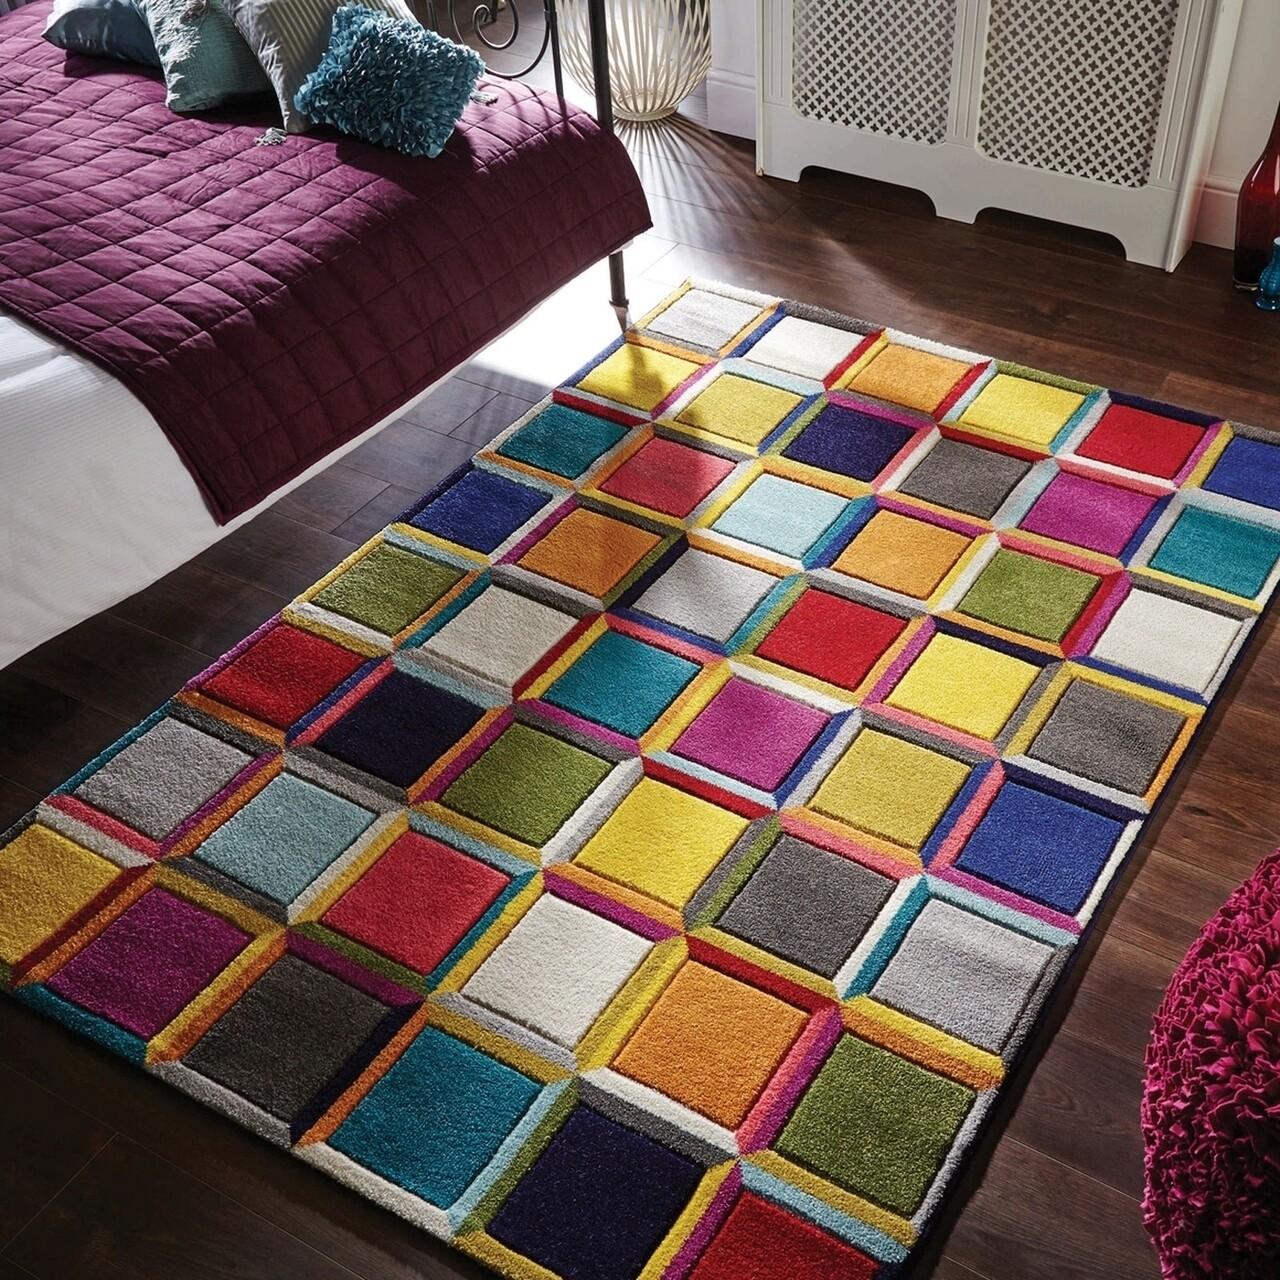 Covor Spectrum Waltz Multi, Flair Rugs, 60 x 230 cm, 100% polipropilena, multicolor